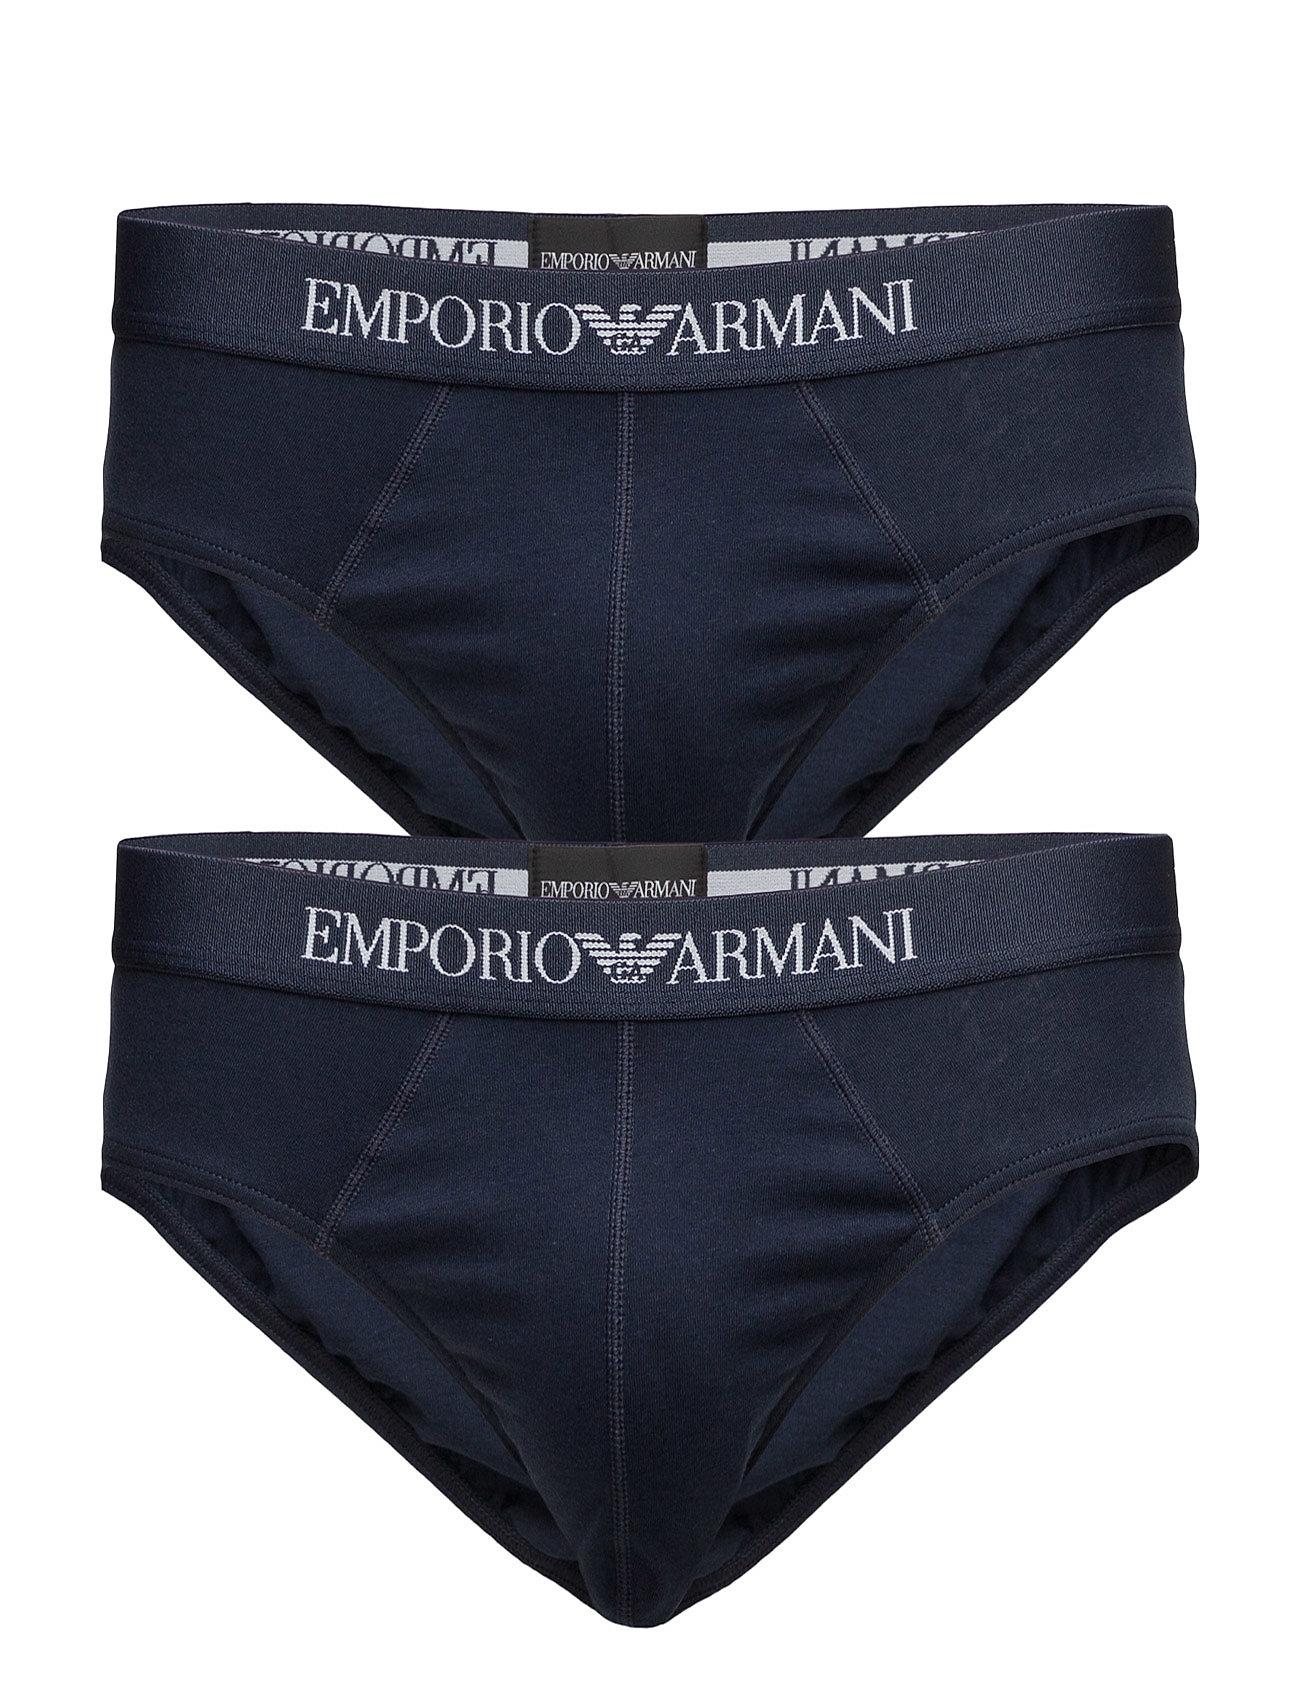 emporio armani Mens knit 2pack brie på boozt.com dk